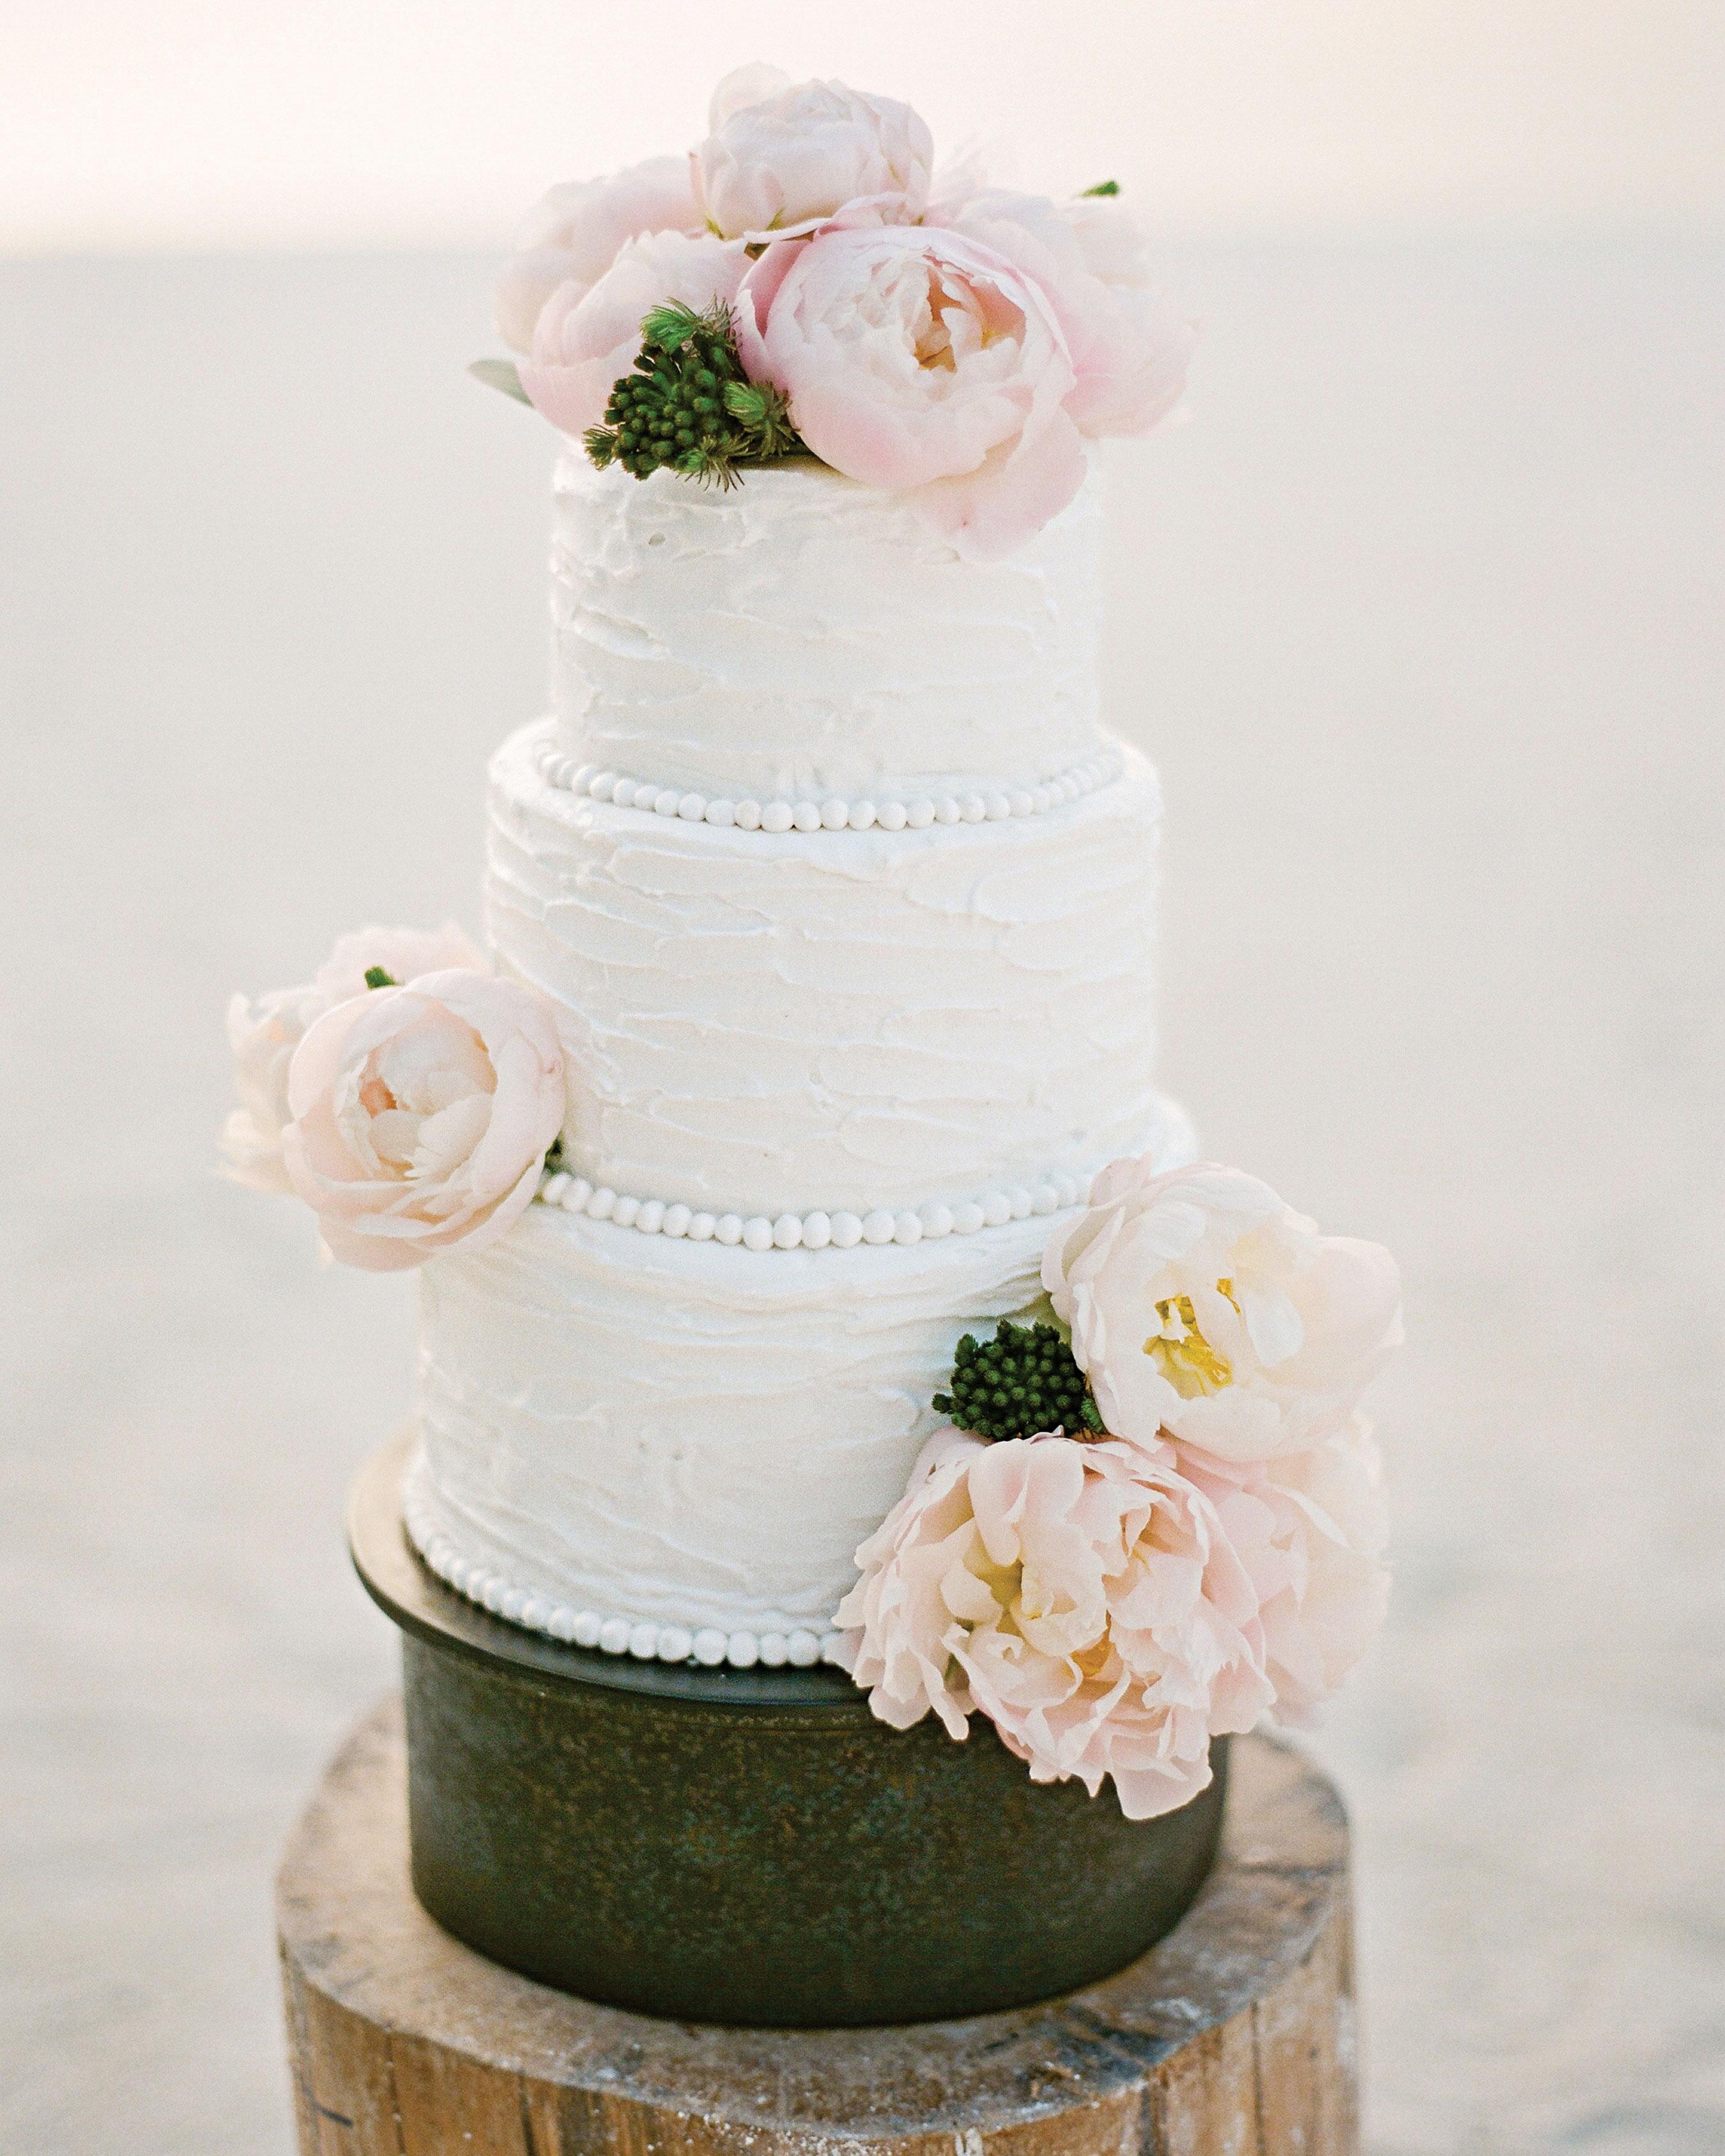 peony-richard-wedding-maldives-white-wedding-cake-flowers-on-beach-1969-s112383.jpg